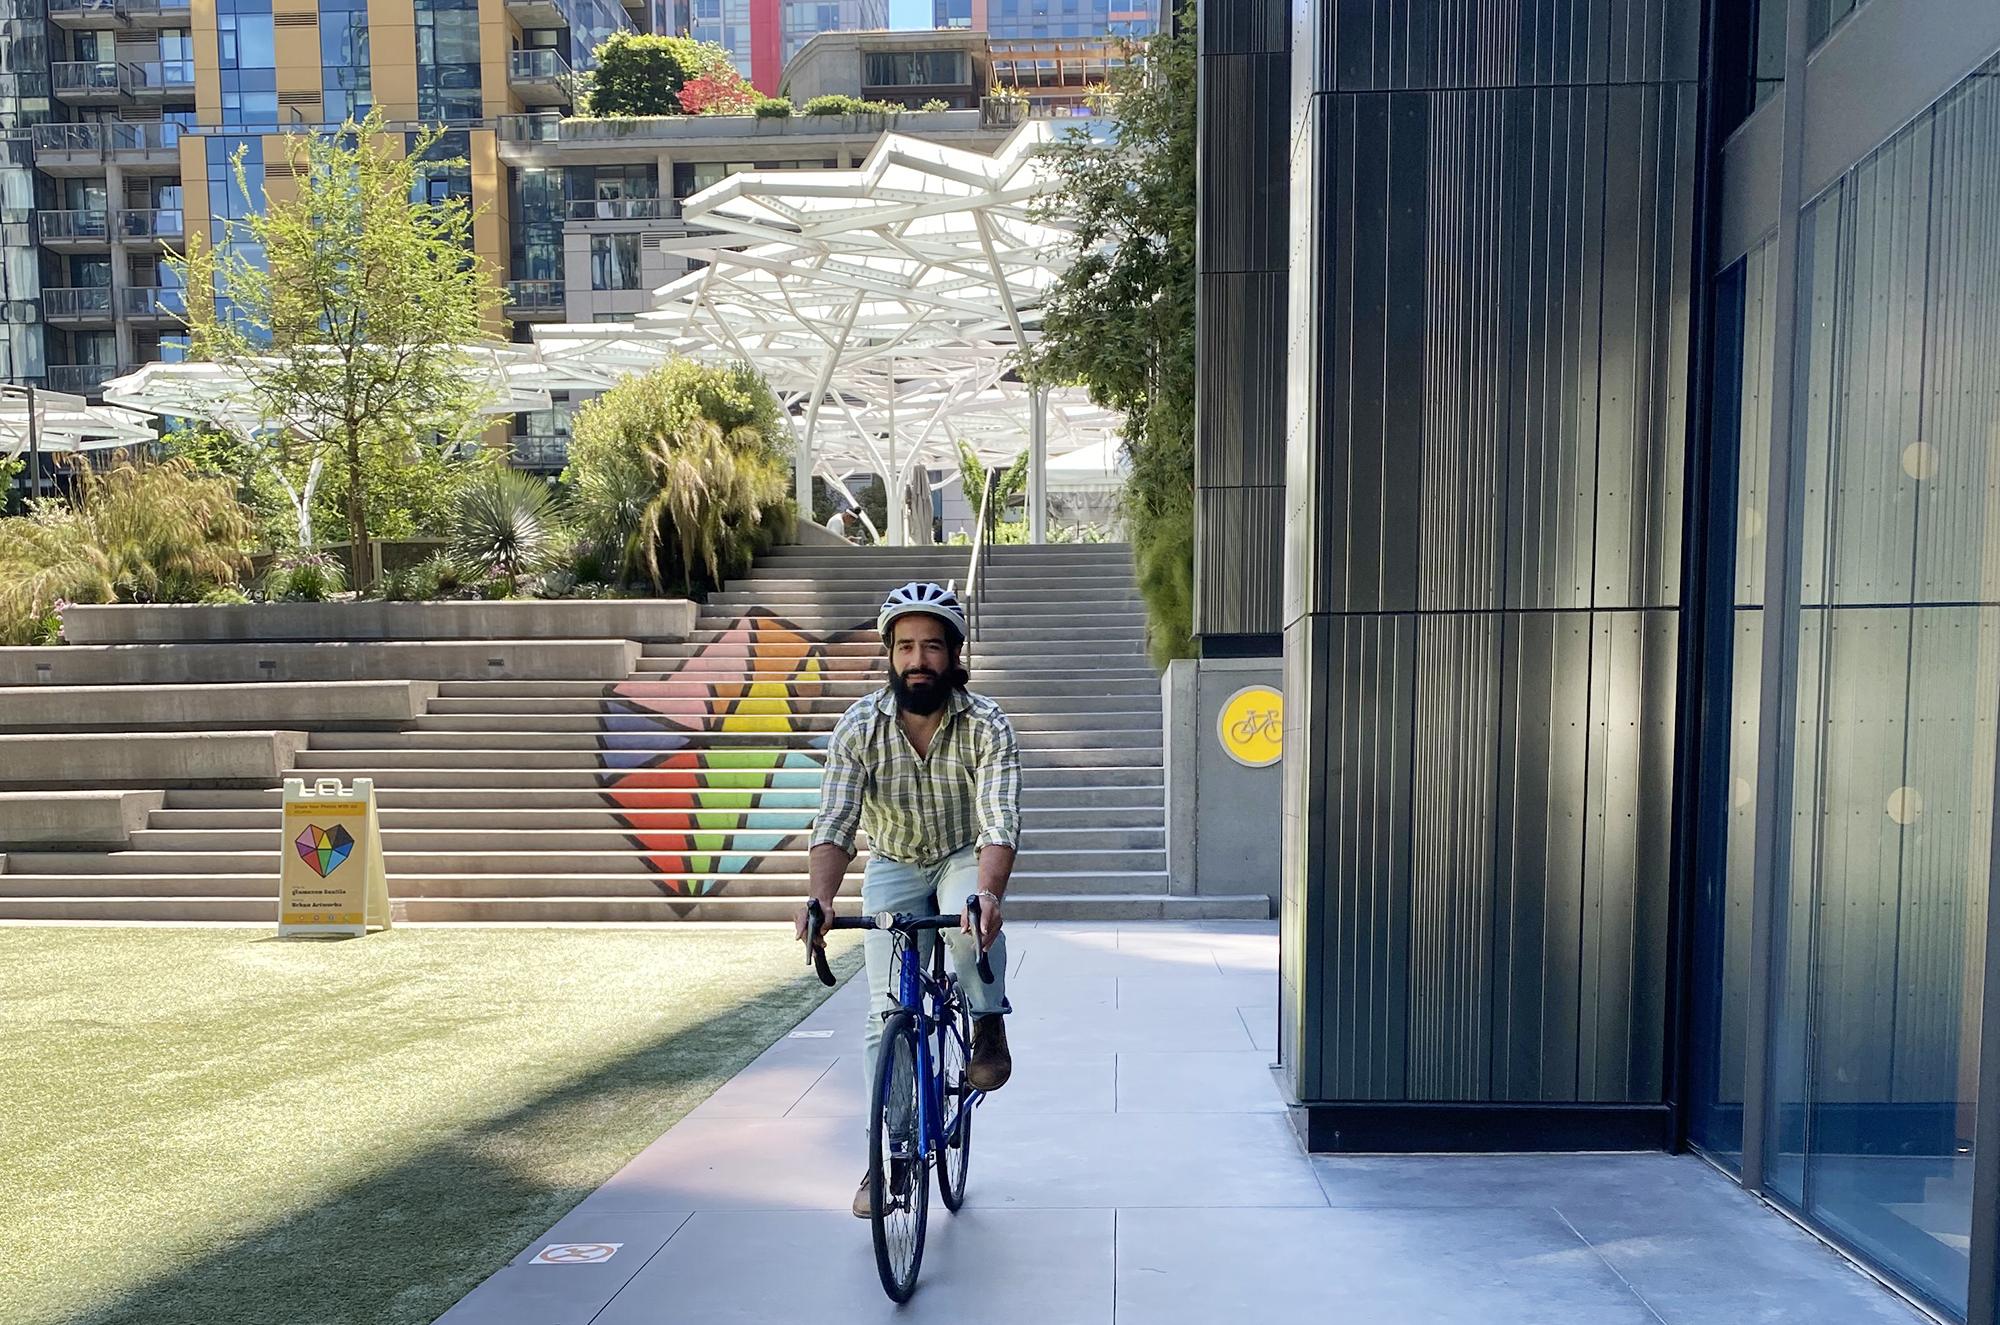 A man rides a bike wearing a helmet through the Amazon HQ in Seattle.